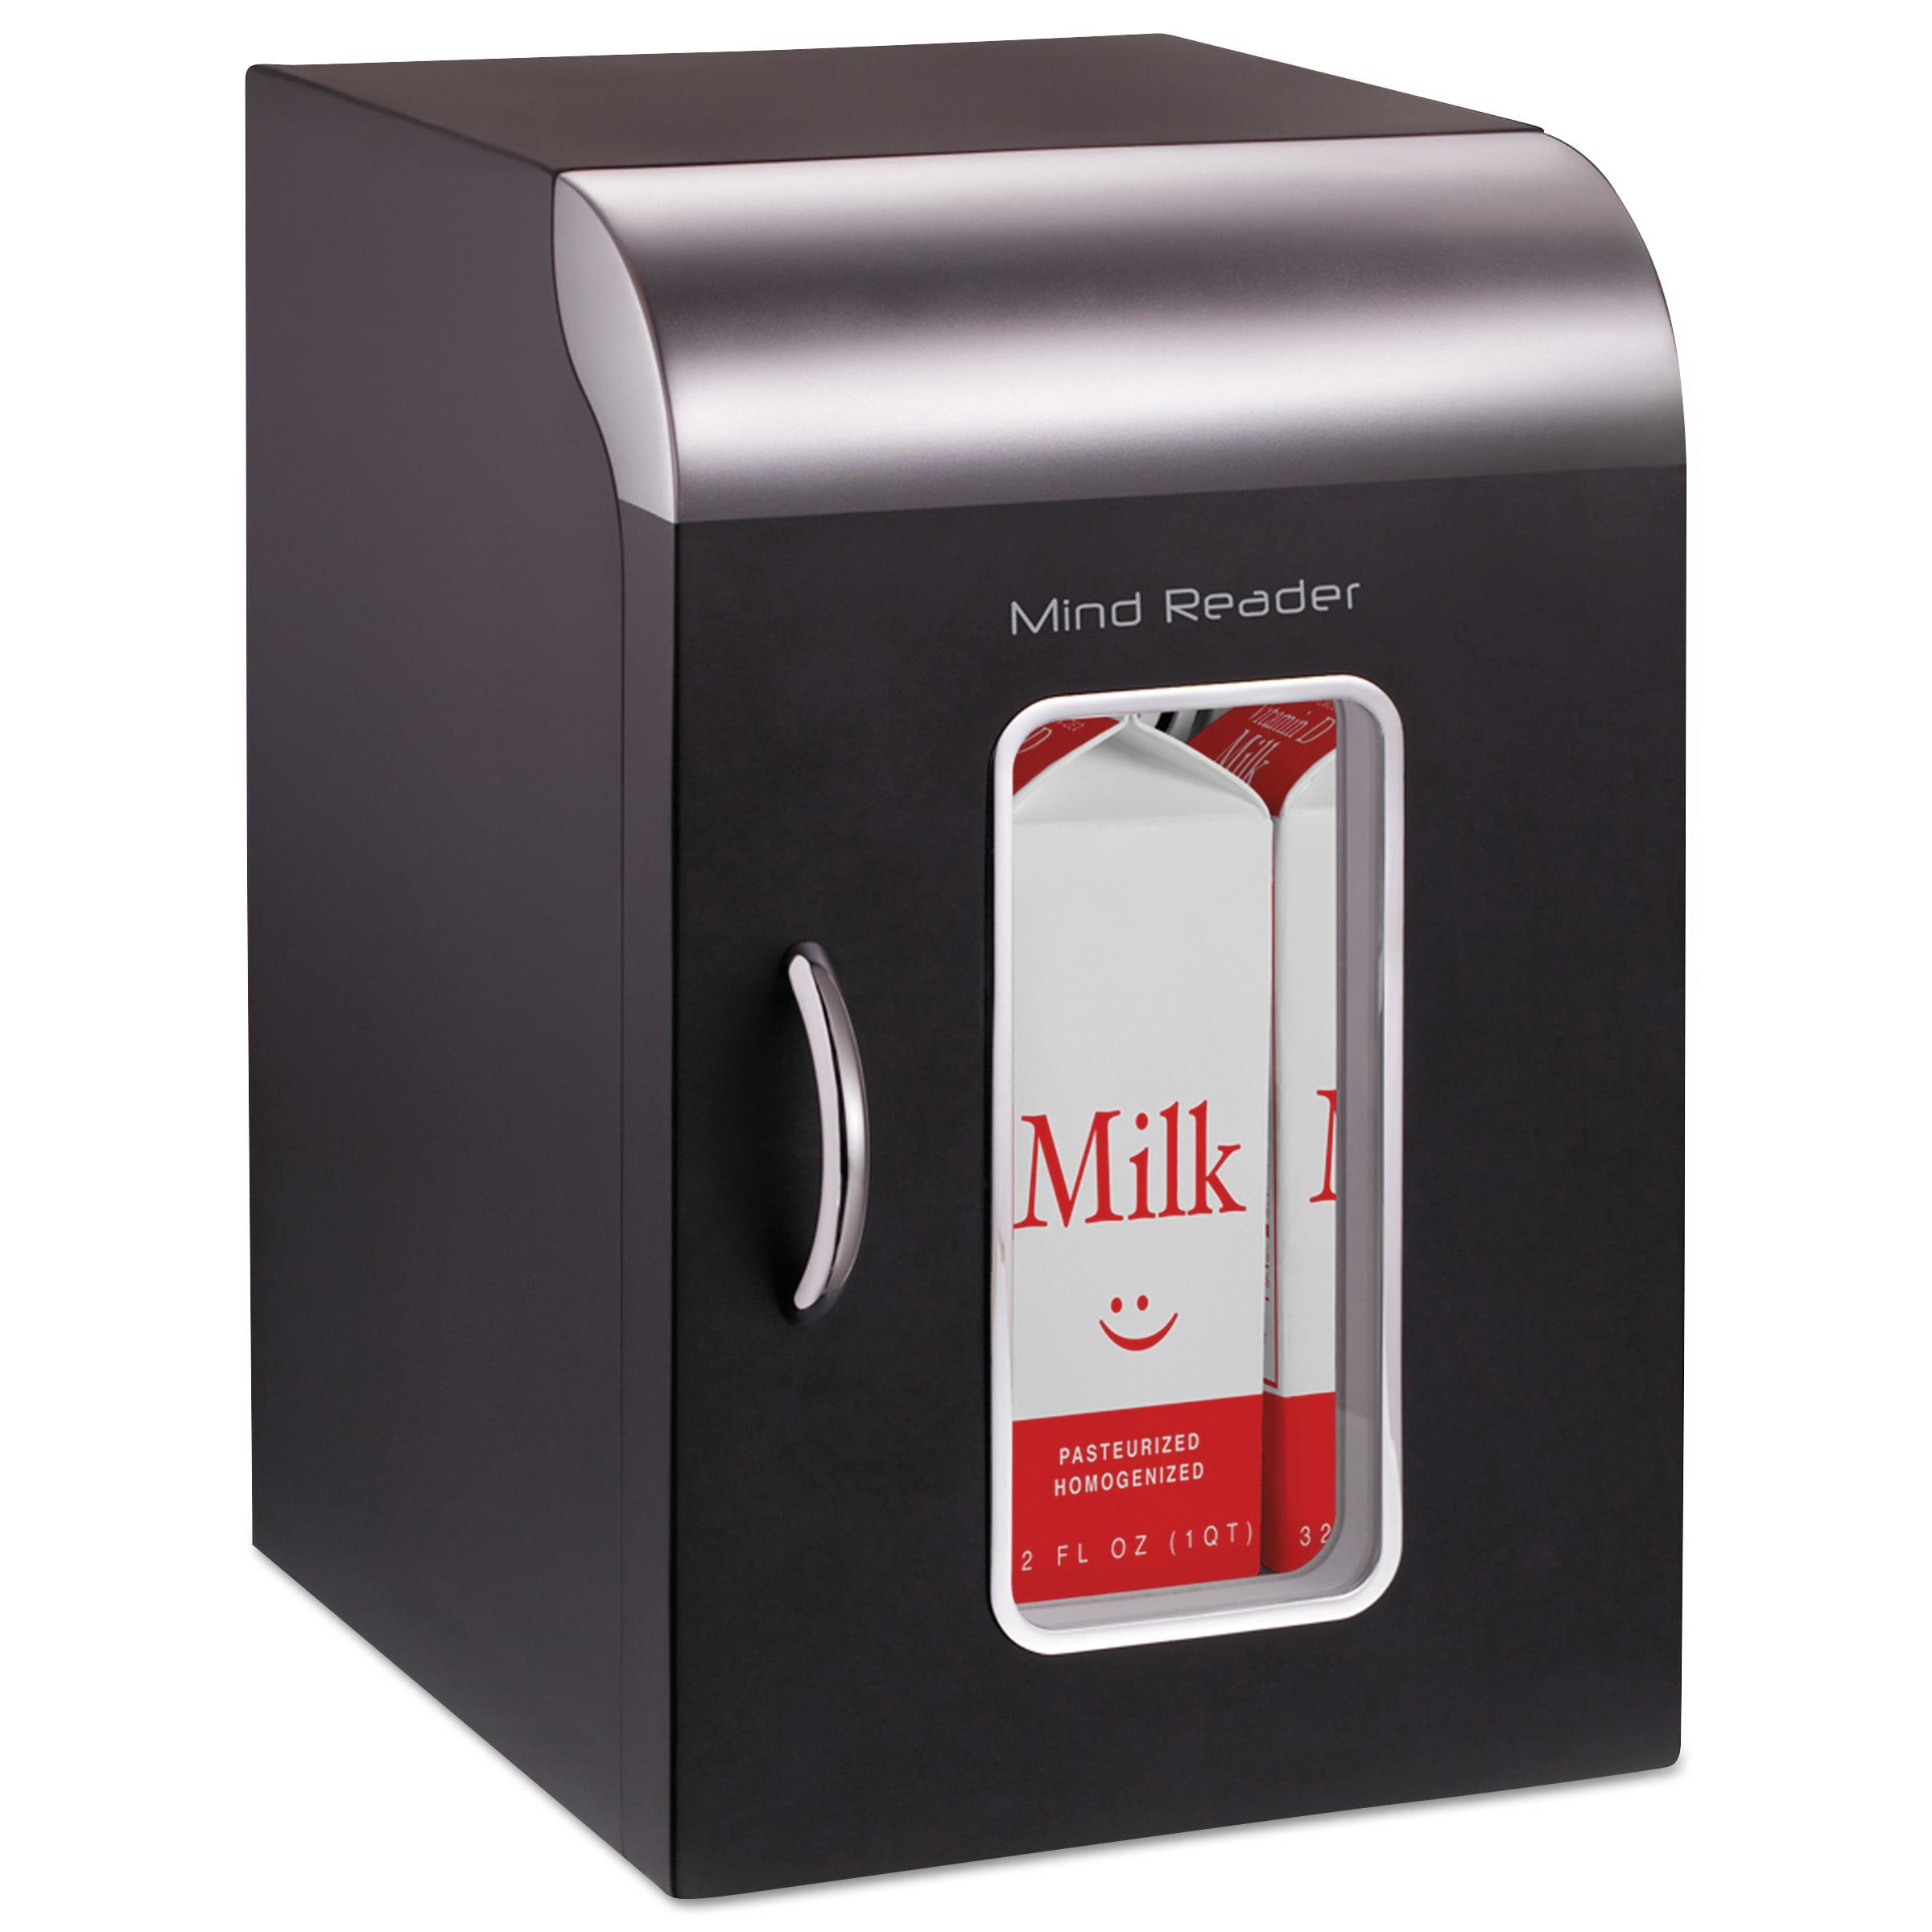 Mind Reader Cube Mini Coffee Station Refrigerator, 0.21 Cu. Ft, Black w/Chrome